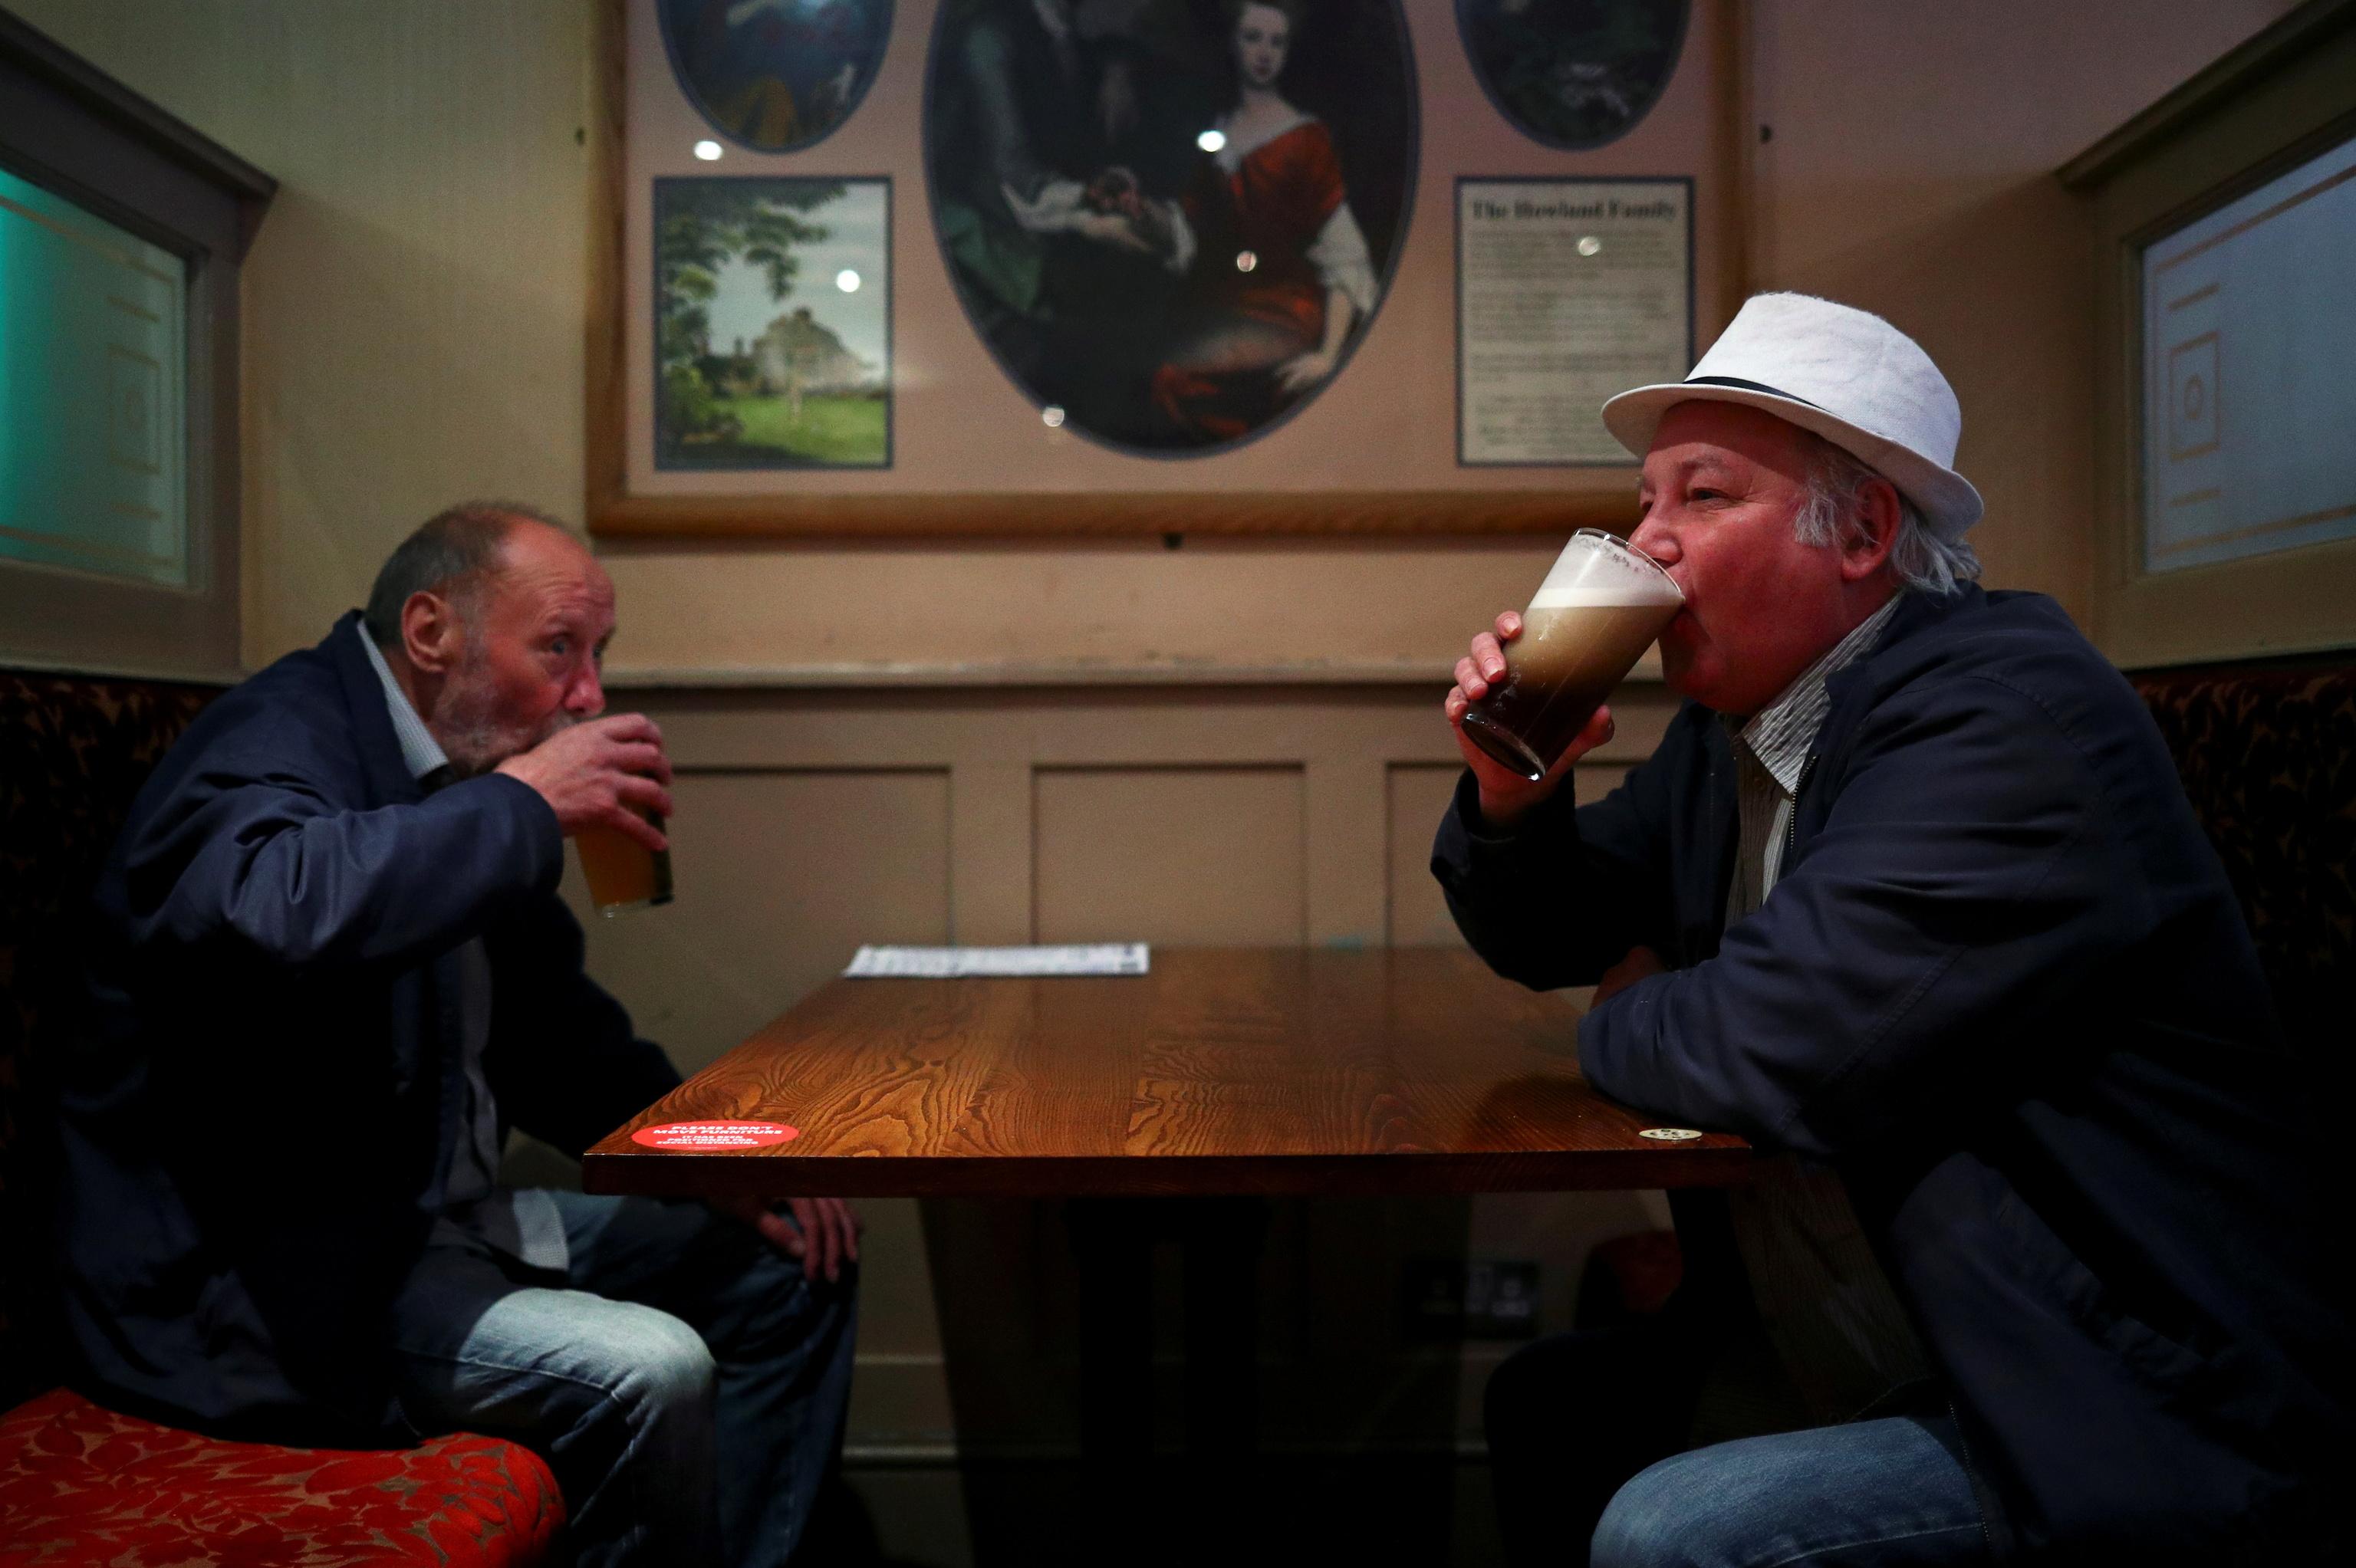 Dos hombres beben cerveza en un pub de Londres.